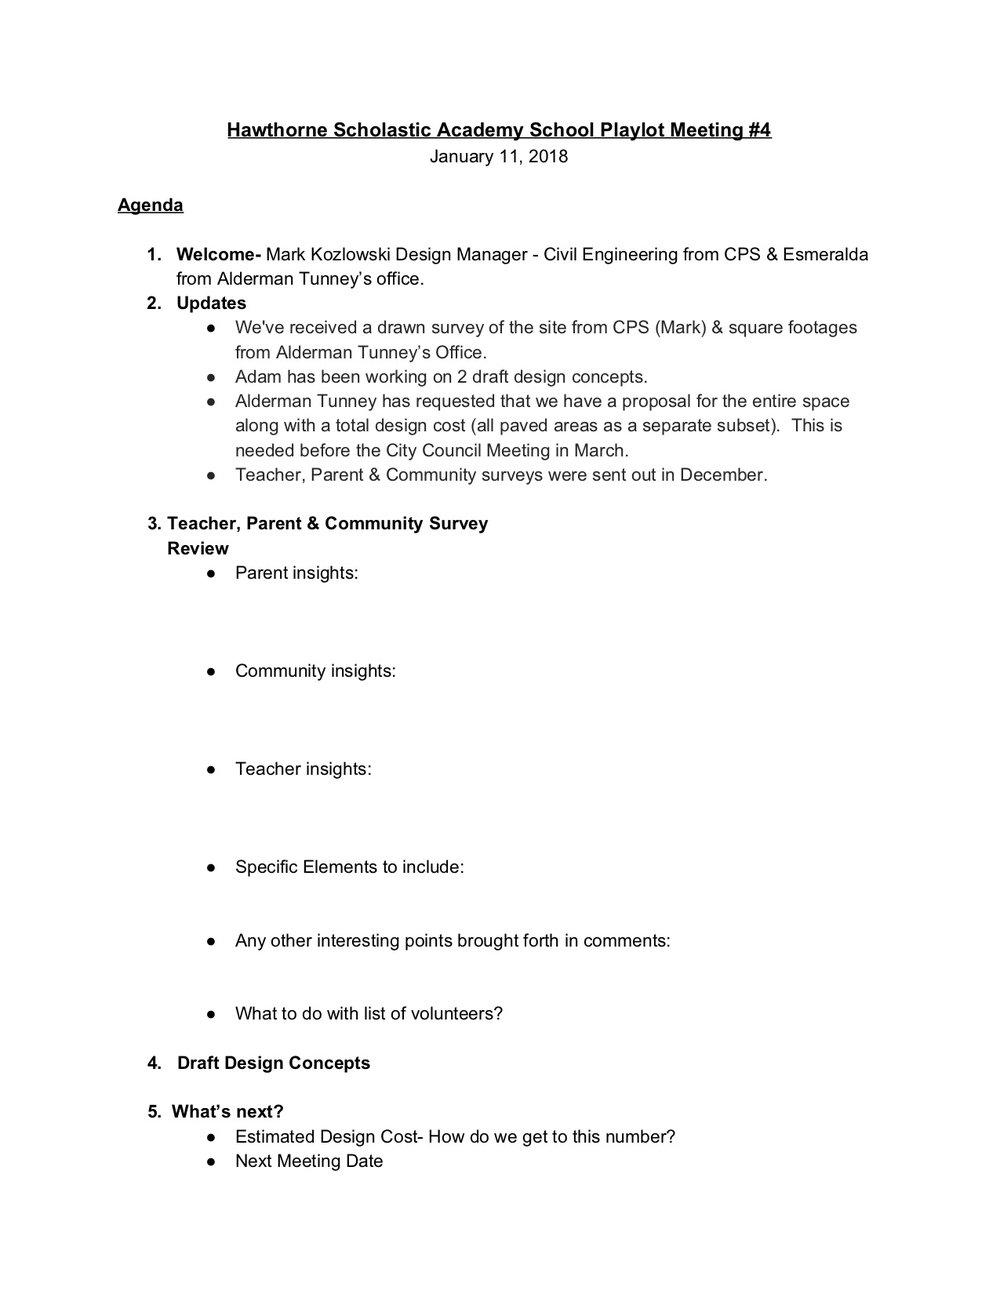 Hawthorne Scholastic Academy School Playlot Meeting #4 Agenda.jpg